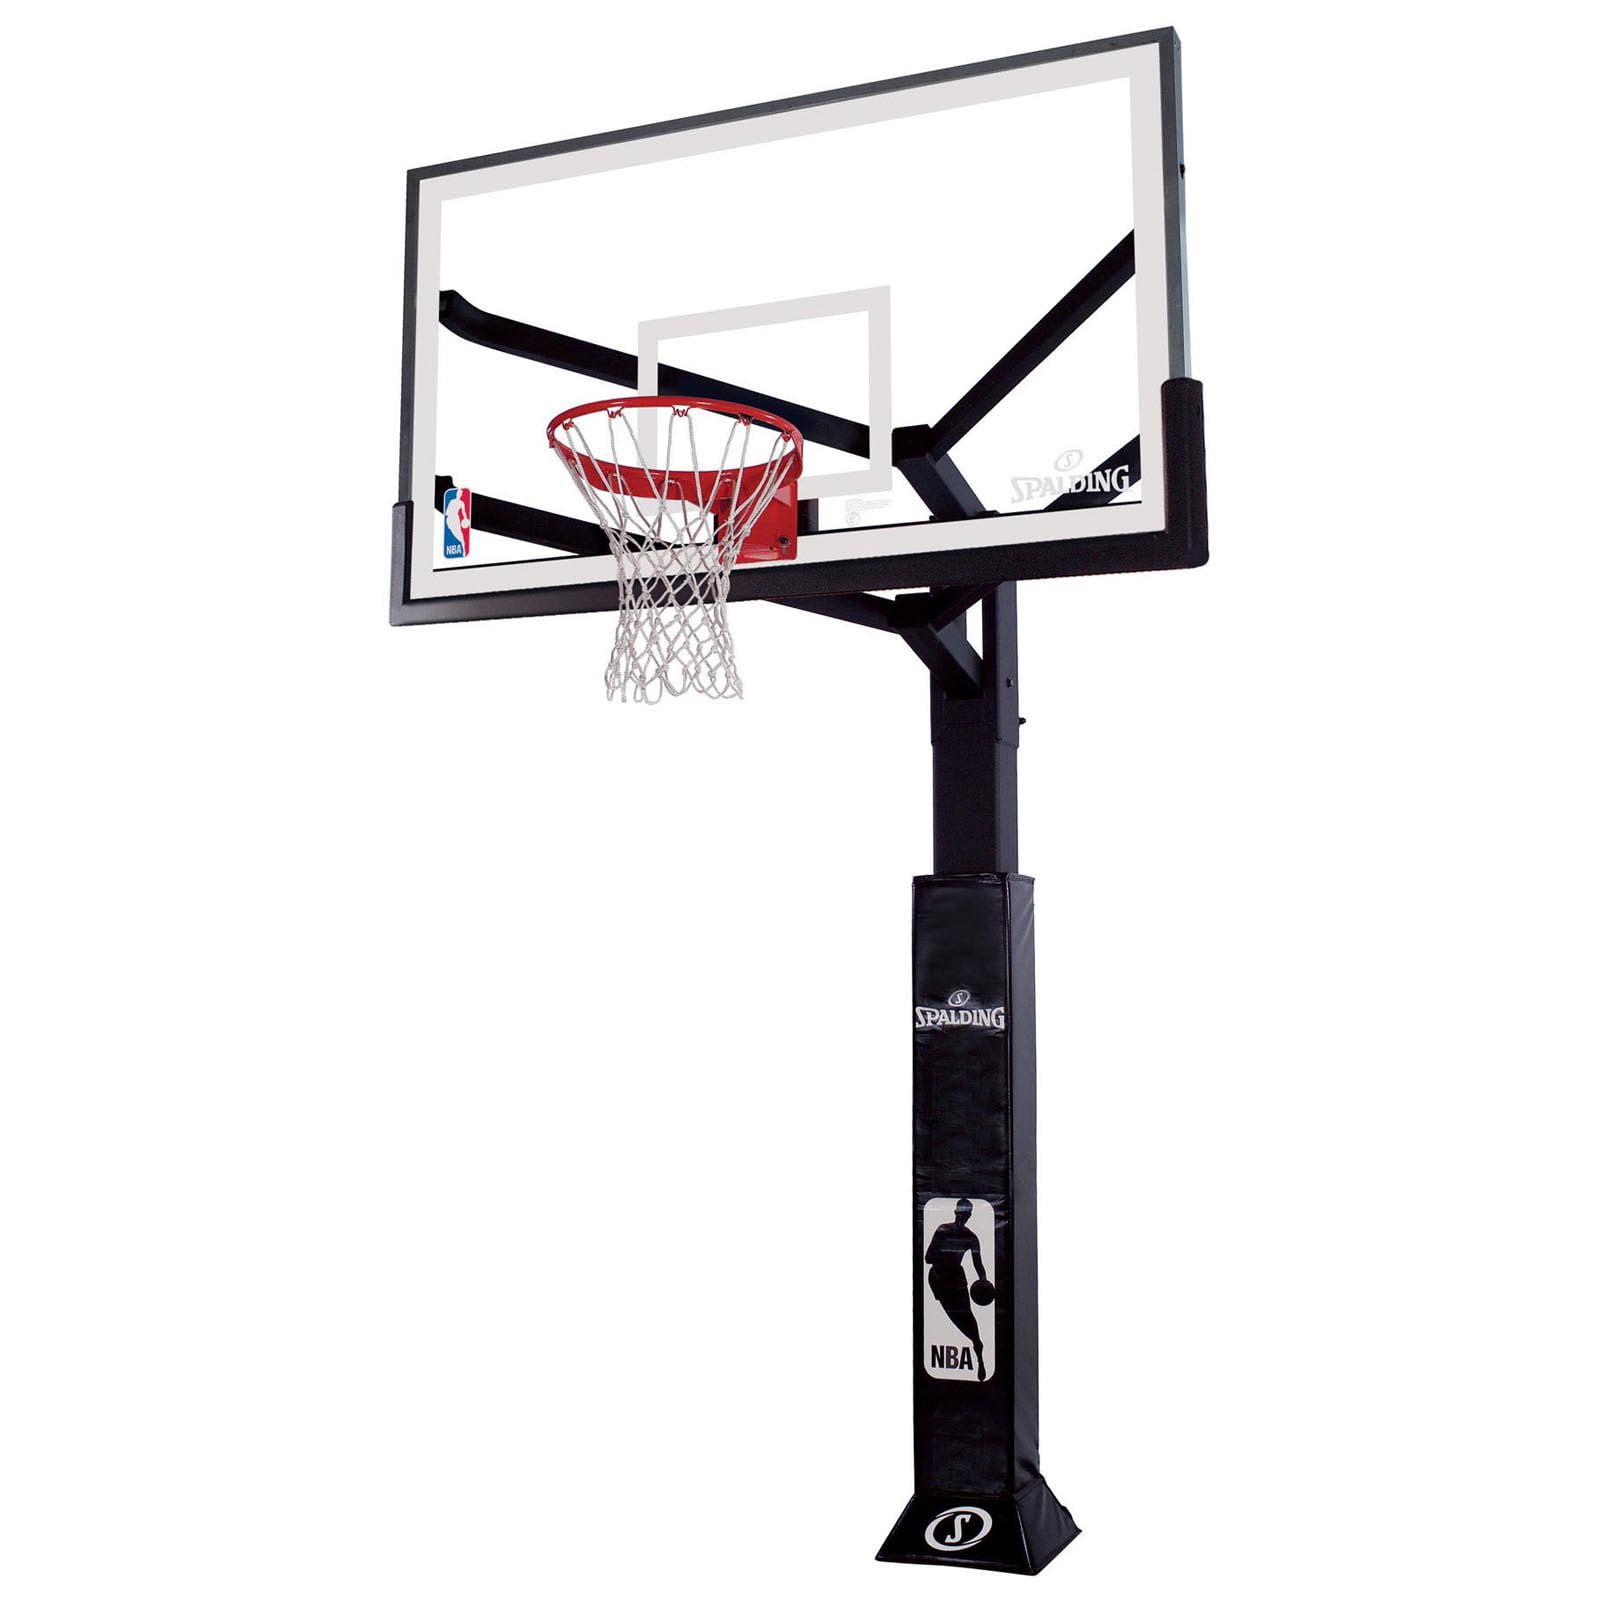 Spalding Arena View Inground Basketball Hoop System